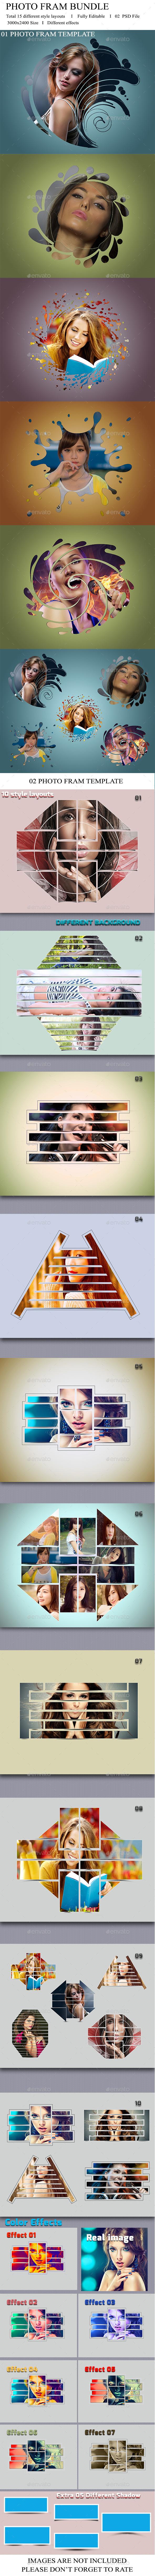 Photo Frame Template Bundle V-01 - Photo Templates Graphics